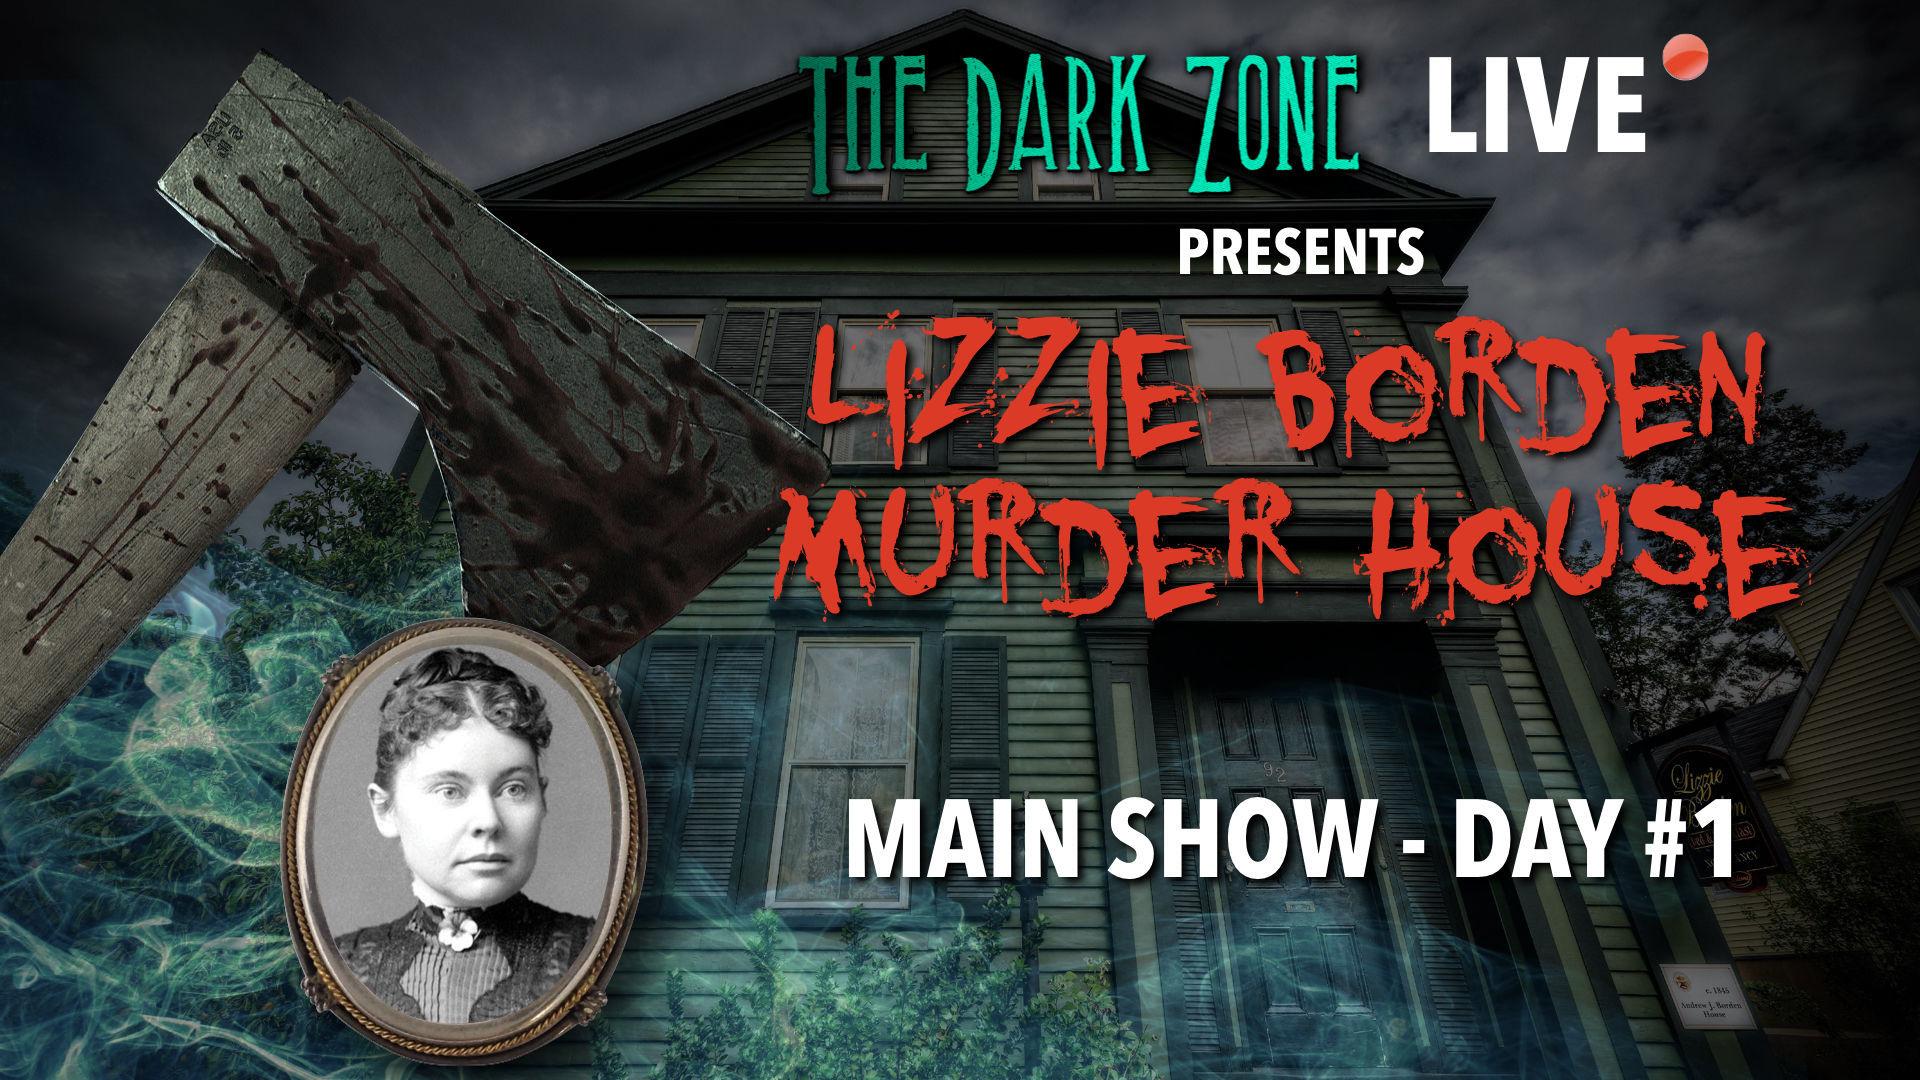 Lizzie Borden Murder House - Main Show - DAY 1 (audio-fixes)